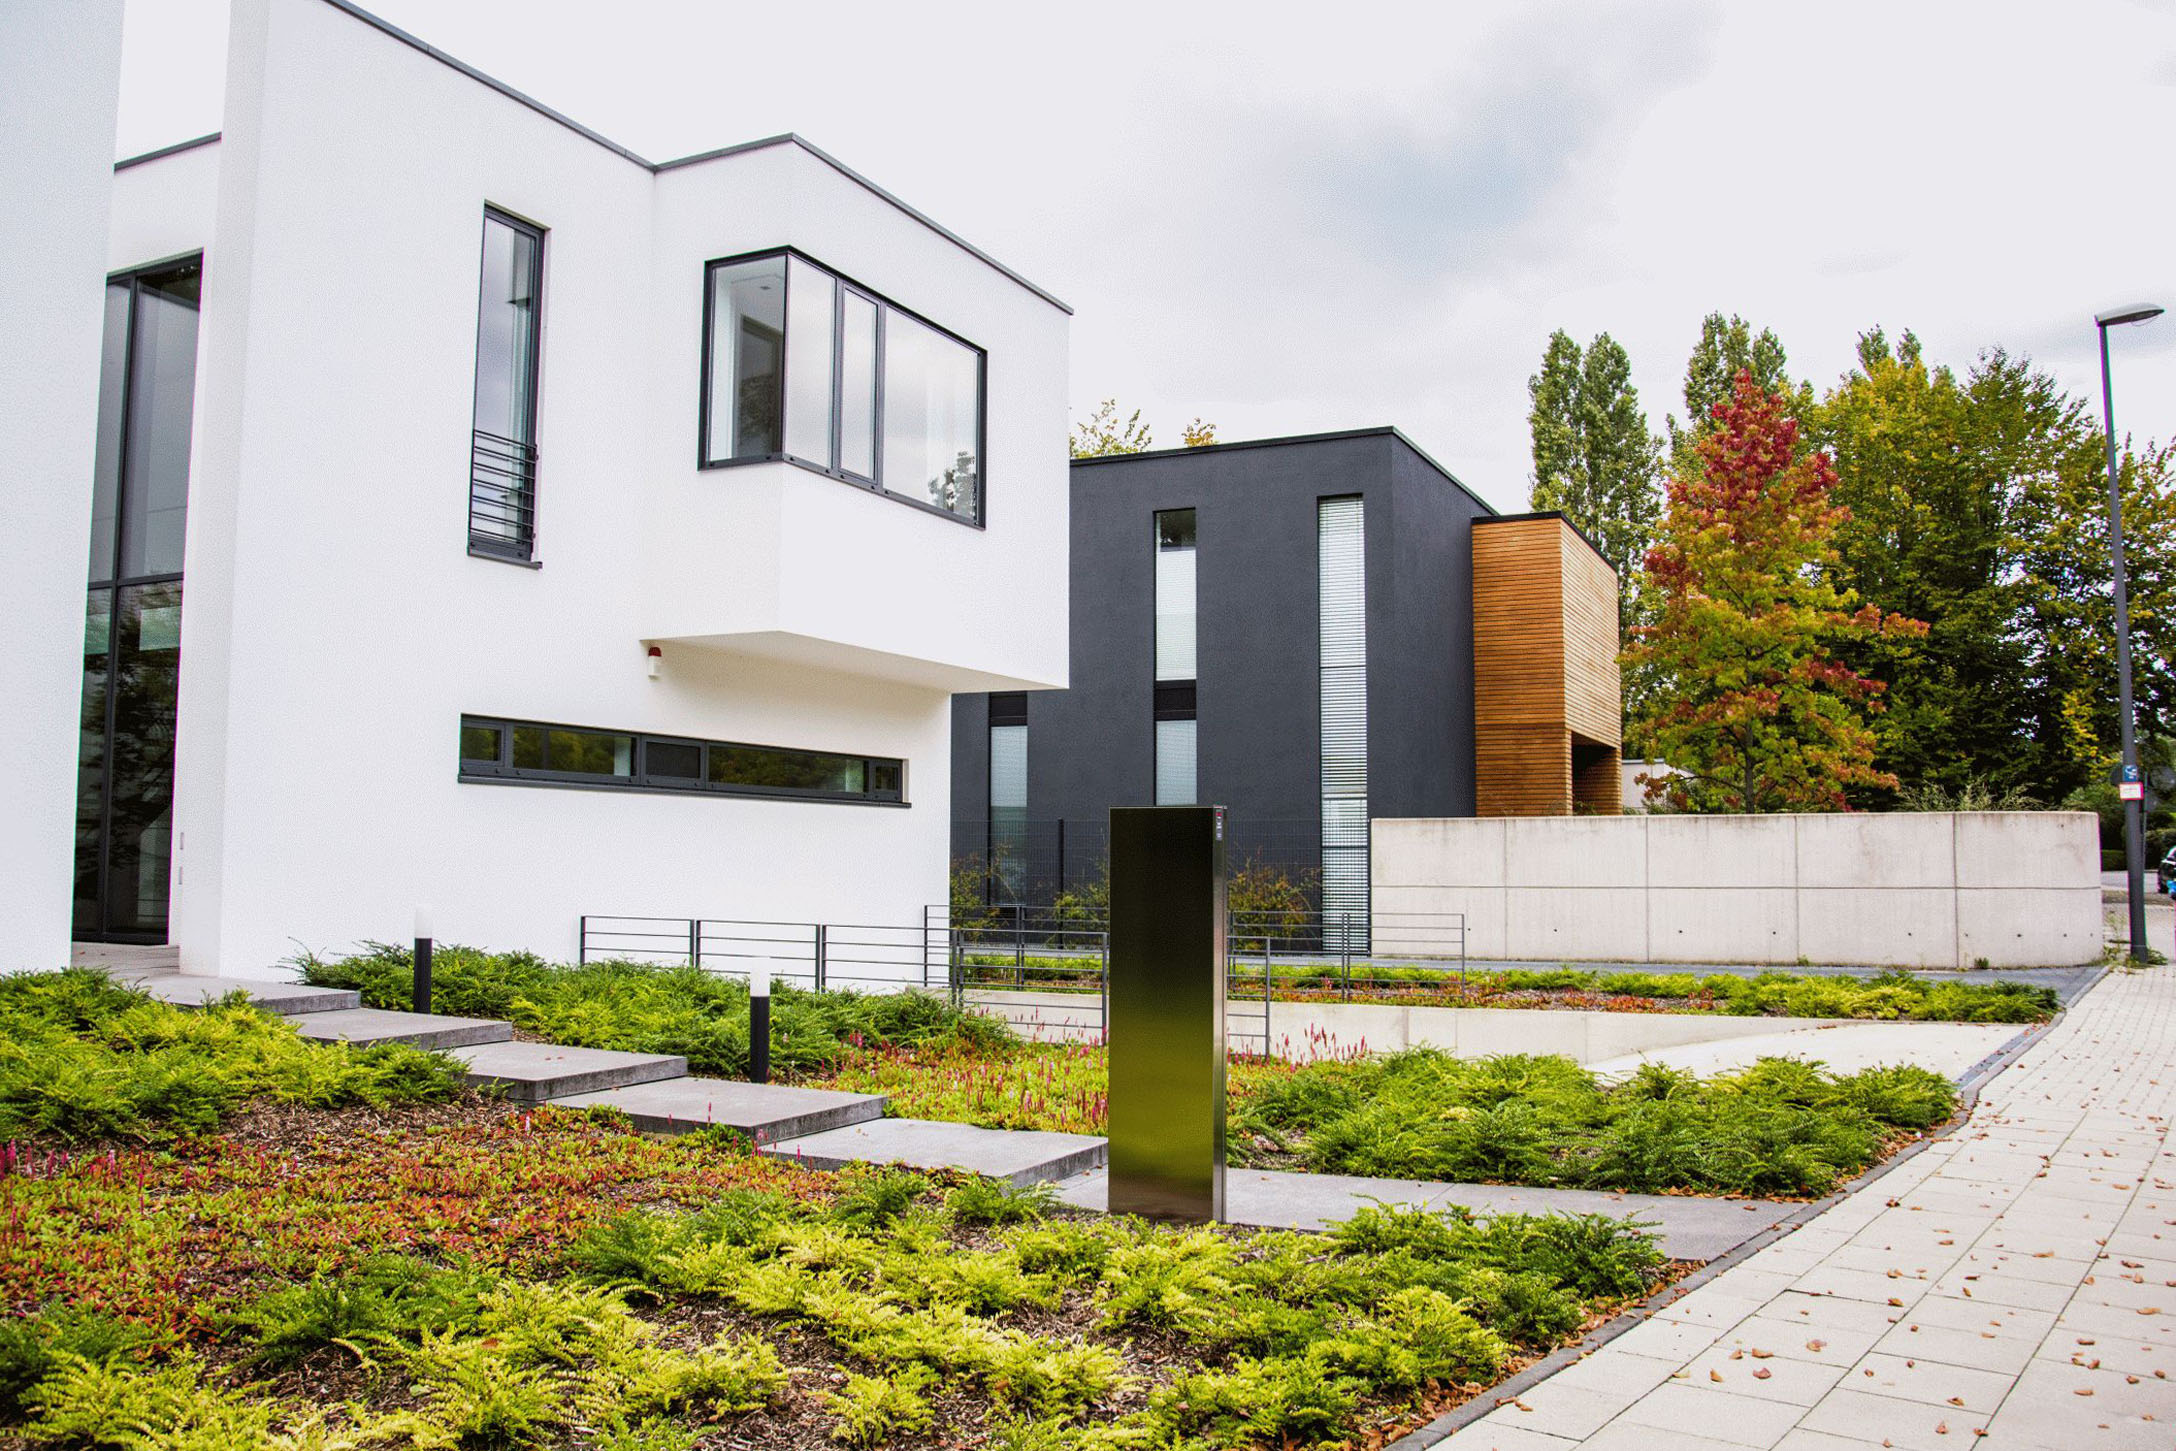 hahnwald k ln wohnen leben. Black Bedroom Furniture Sets. Home Design Ideas